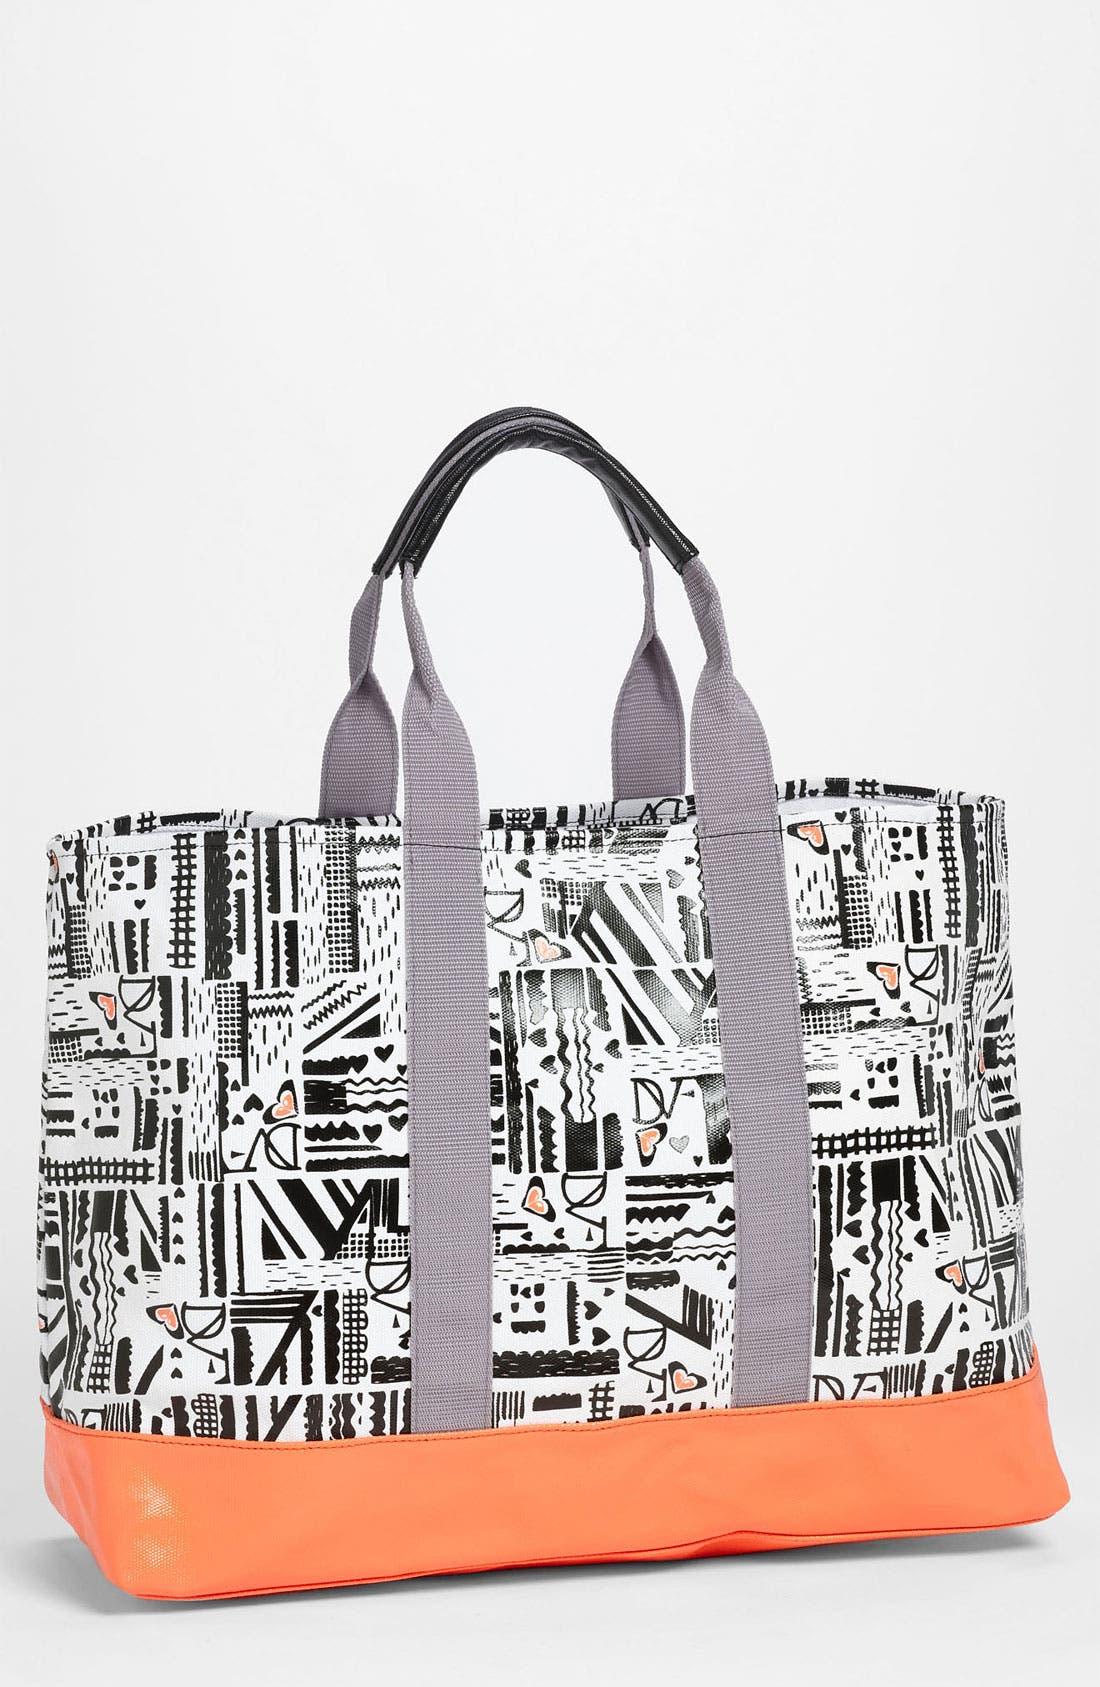 Alternate Image 1 Selected - 'DVF Loves Roxy' Tote Bag